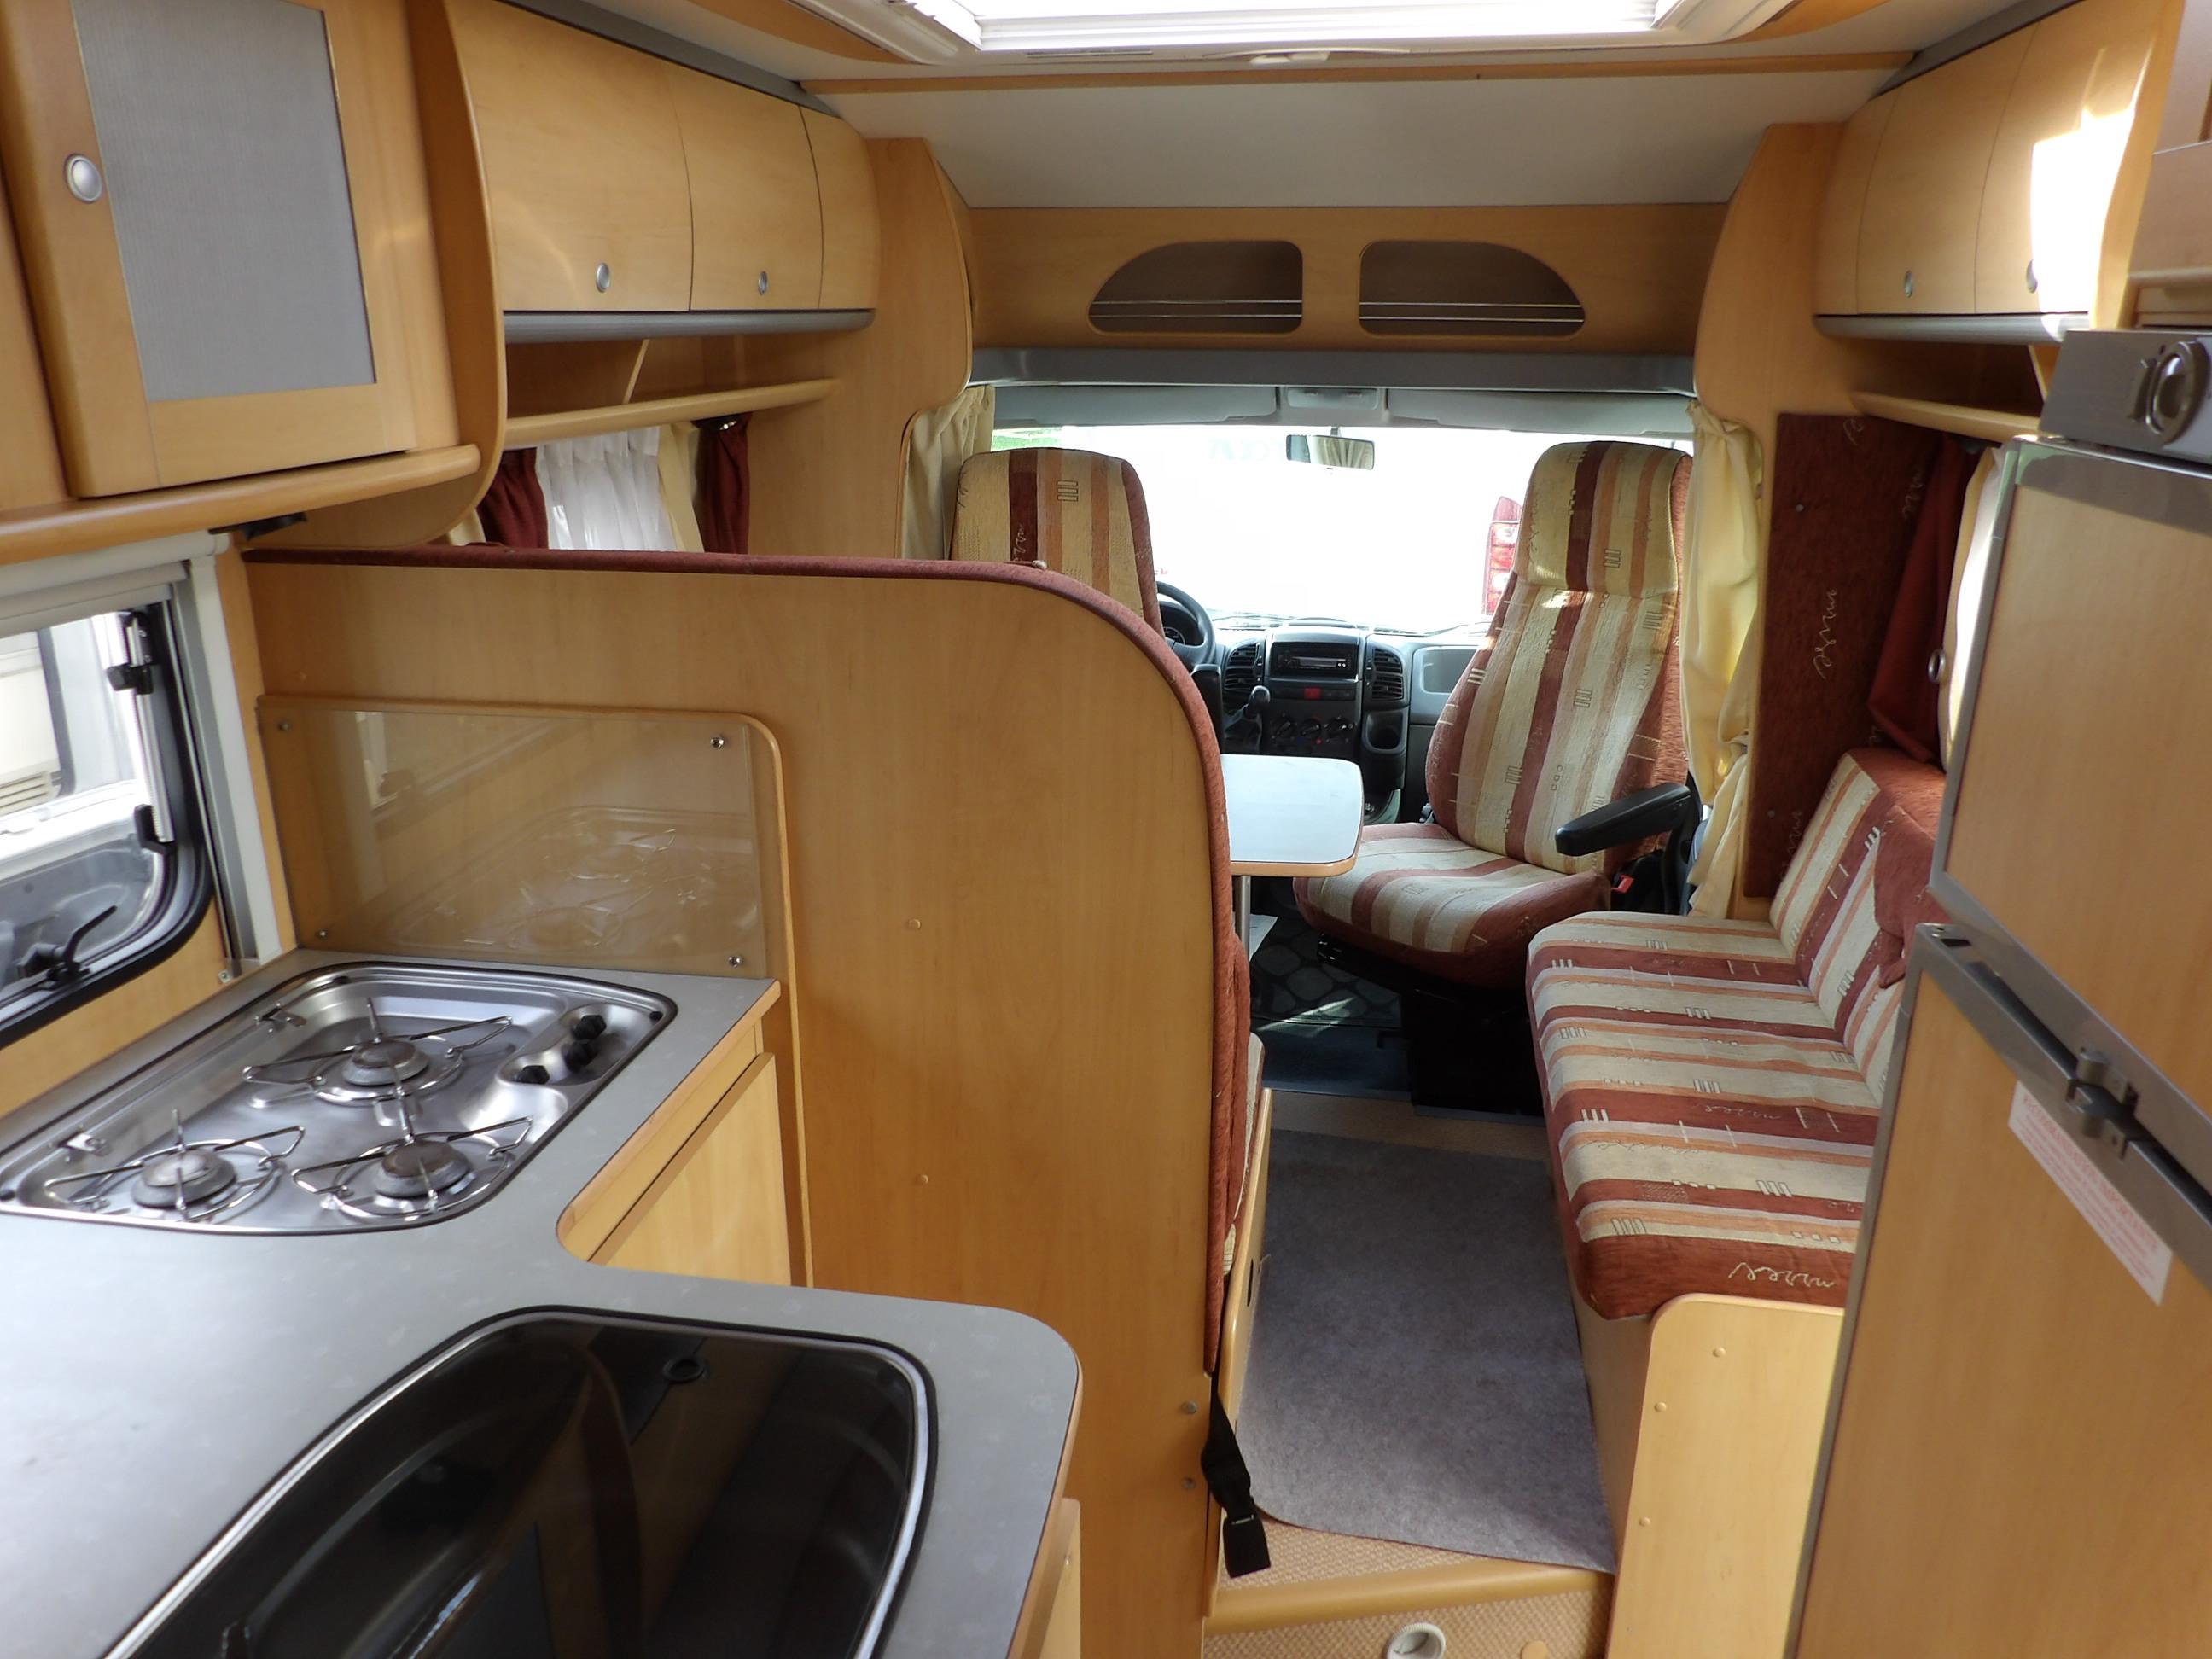 dethleffs advantage t 6501 occasion de 2005 fiat camping car en vente locoal mendon sortie. Black Bedroom Furniture Sets. Home Design Ideas